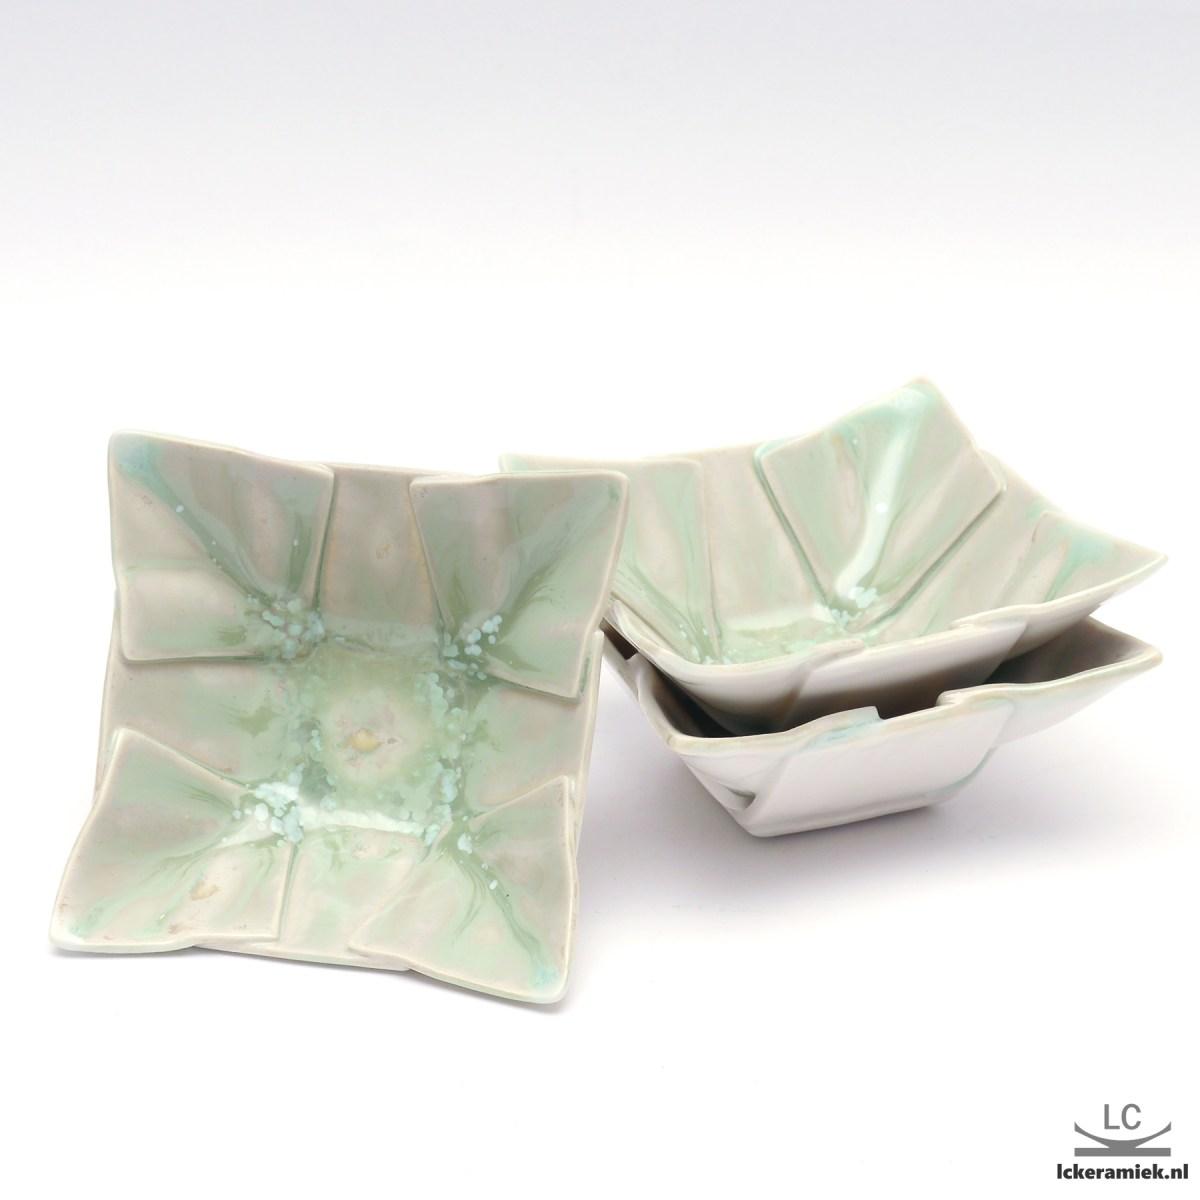 groene porseleinen tapas/amuse schaaltjes